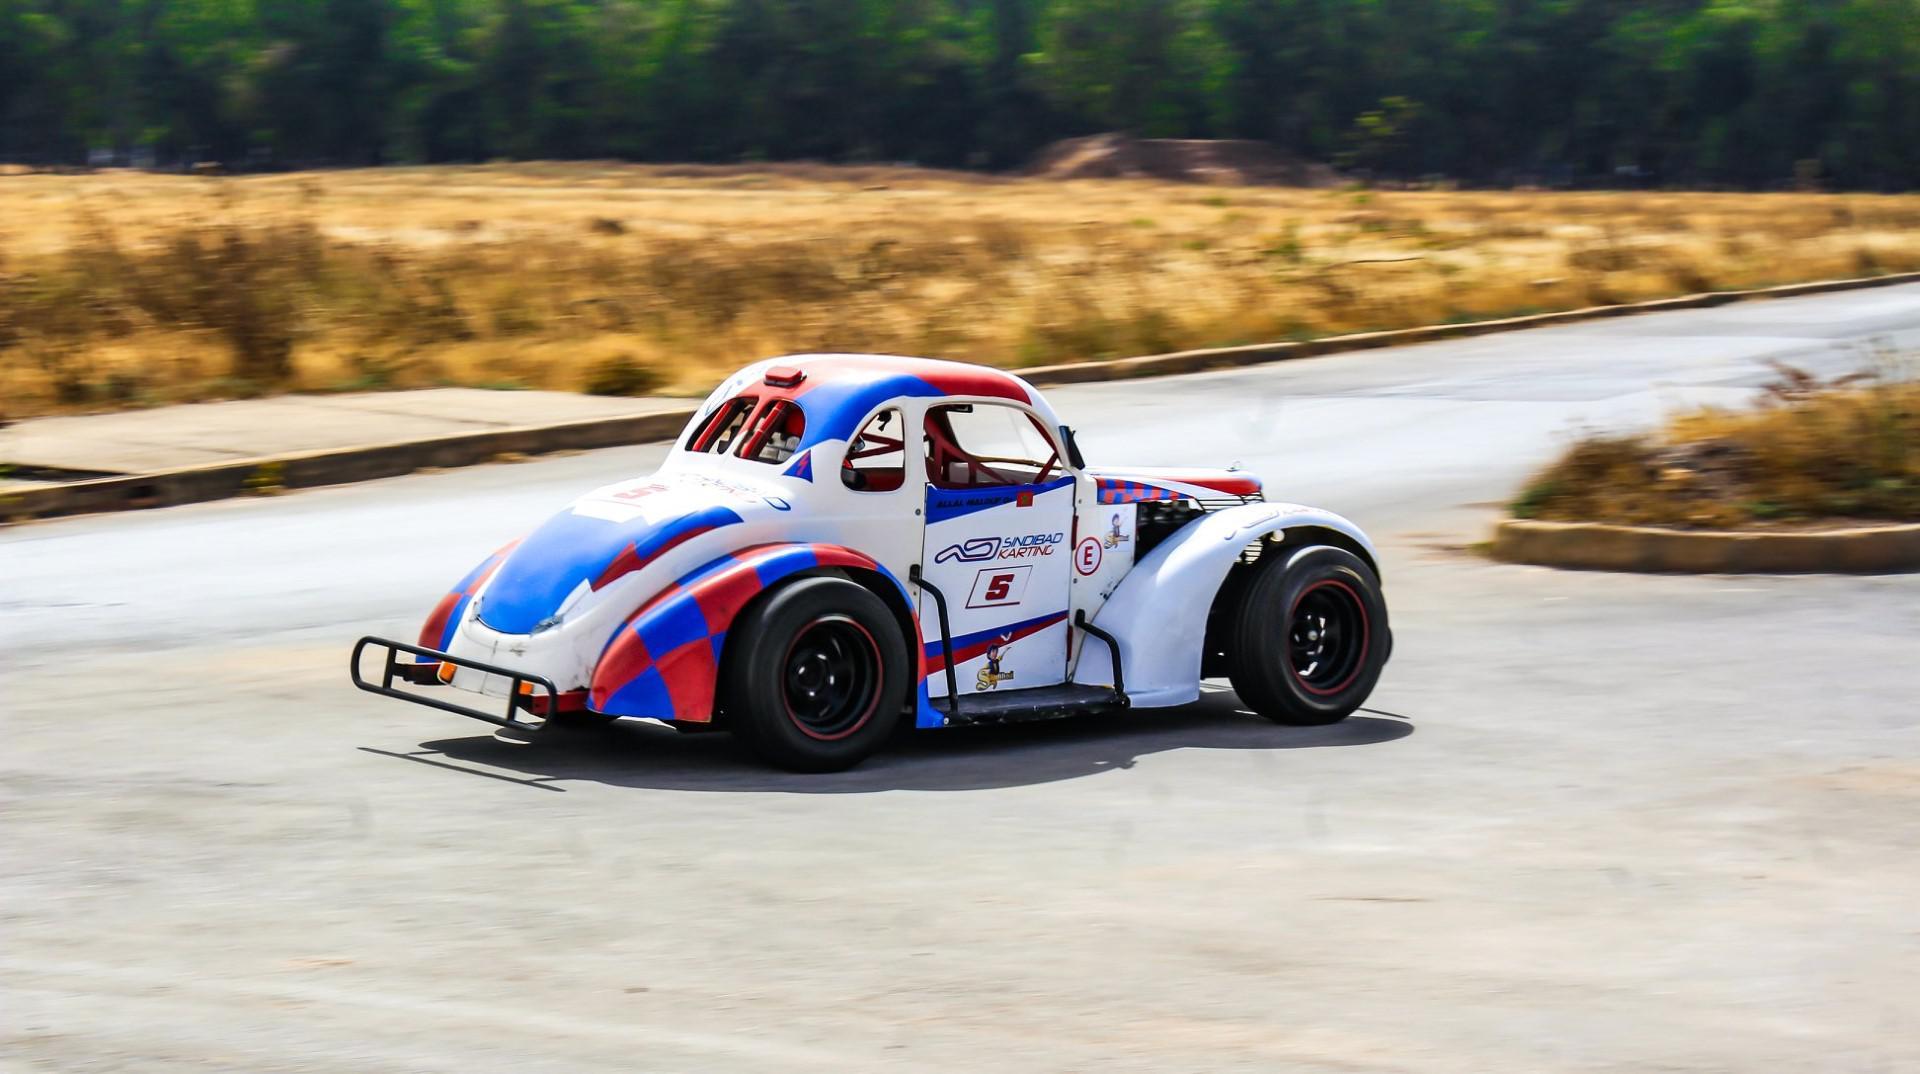 qui-sont-team-am-racing-1043-5.jpg